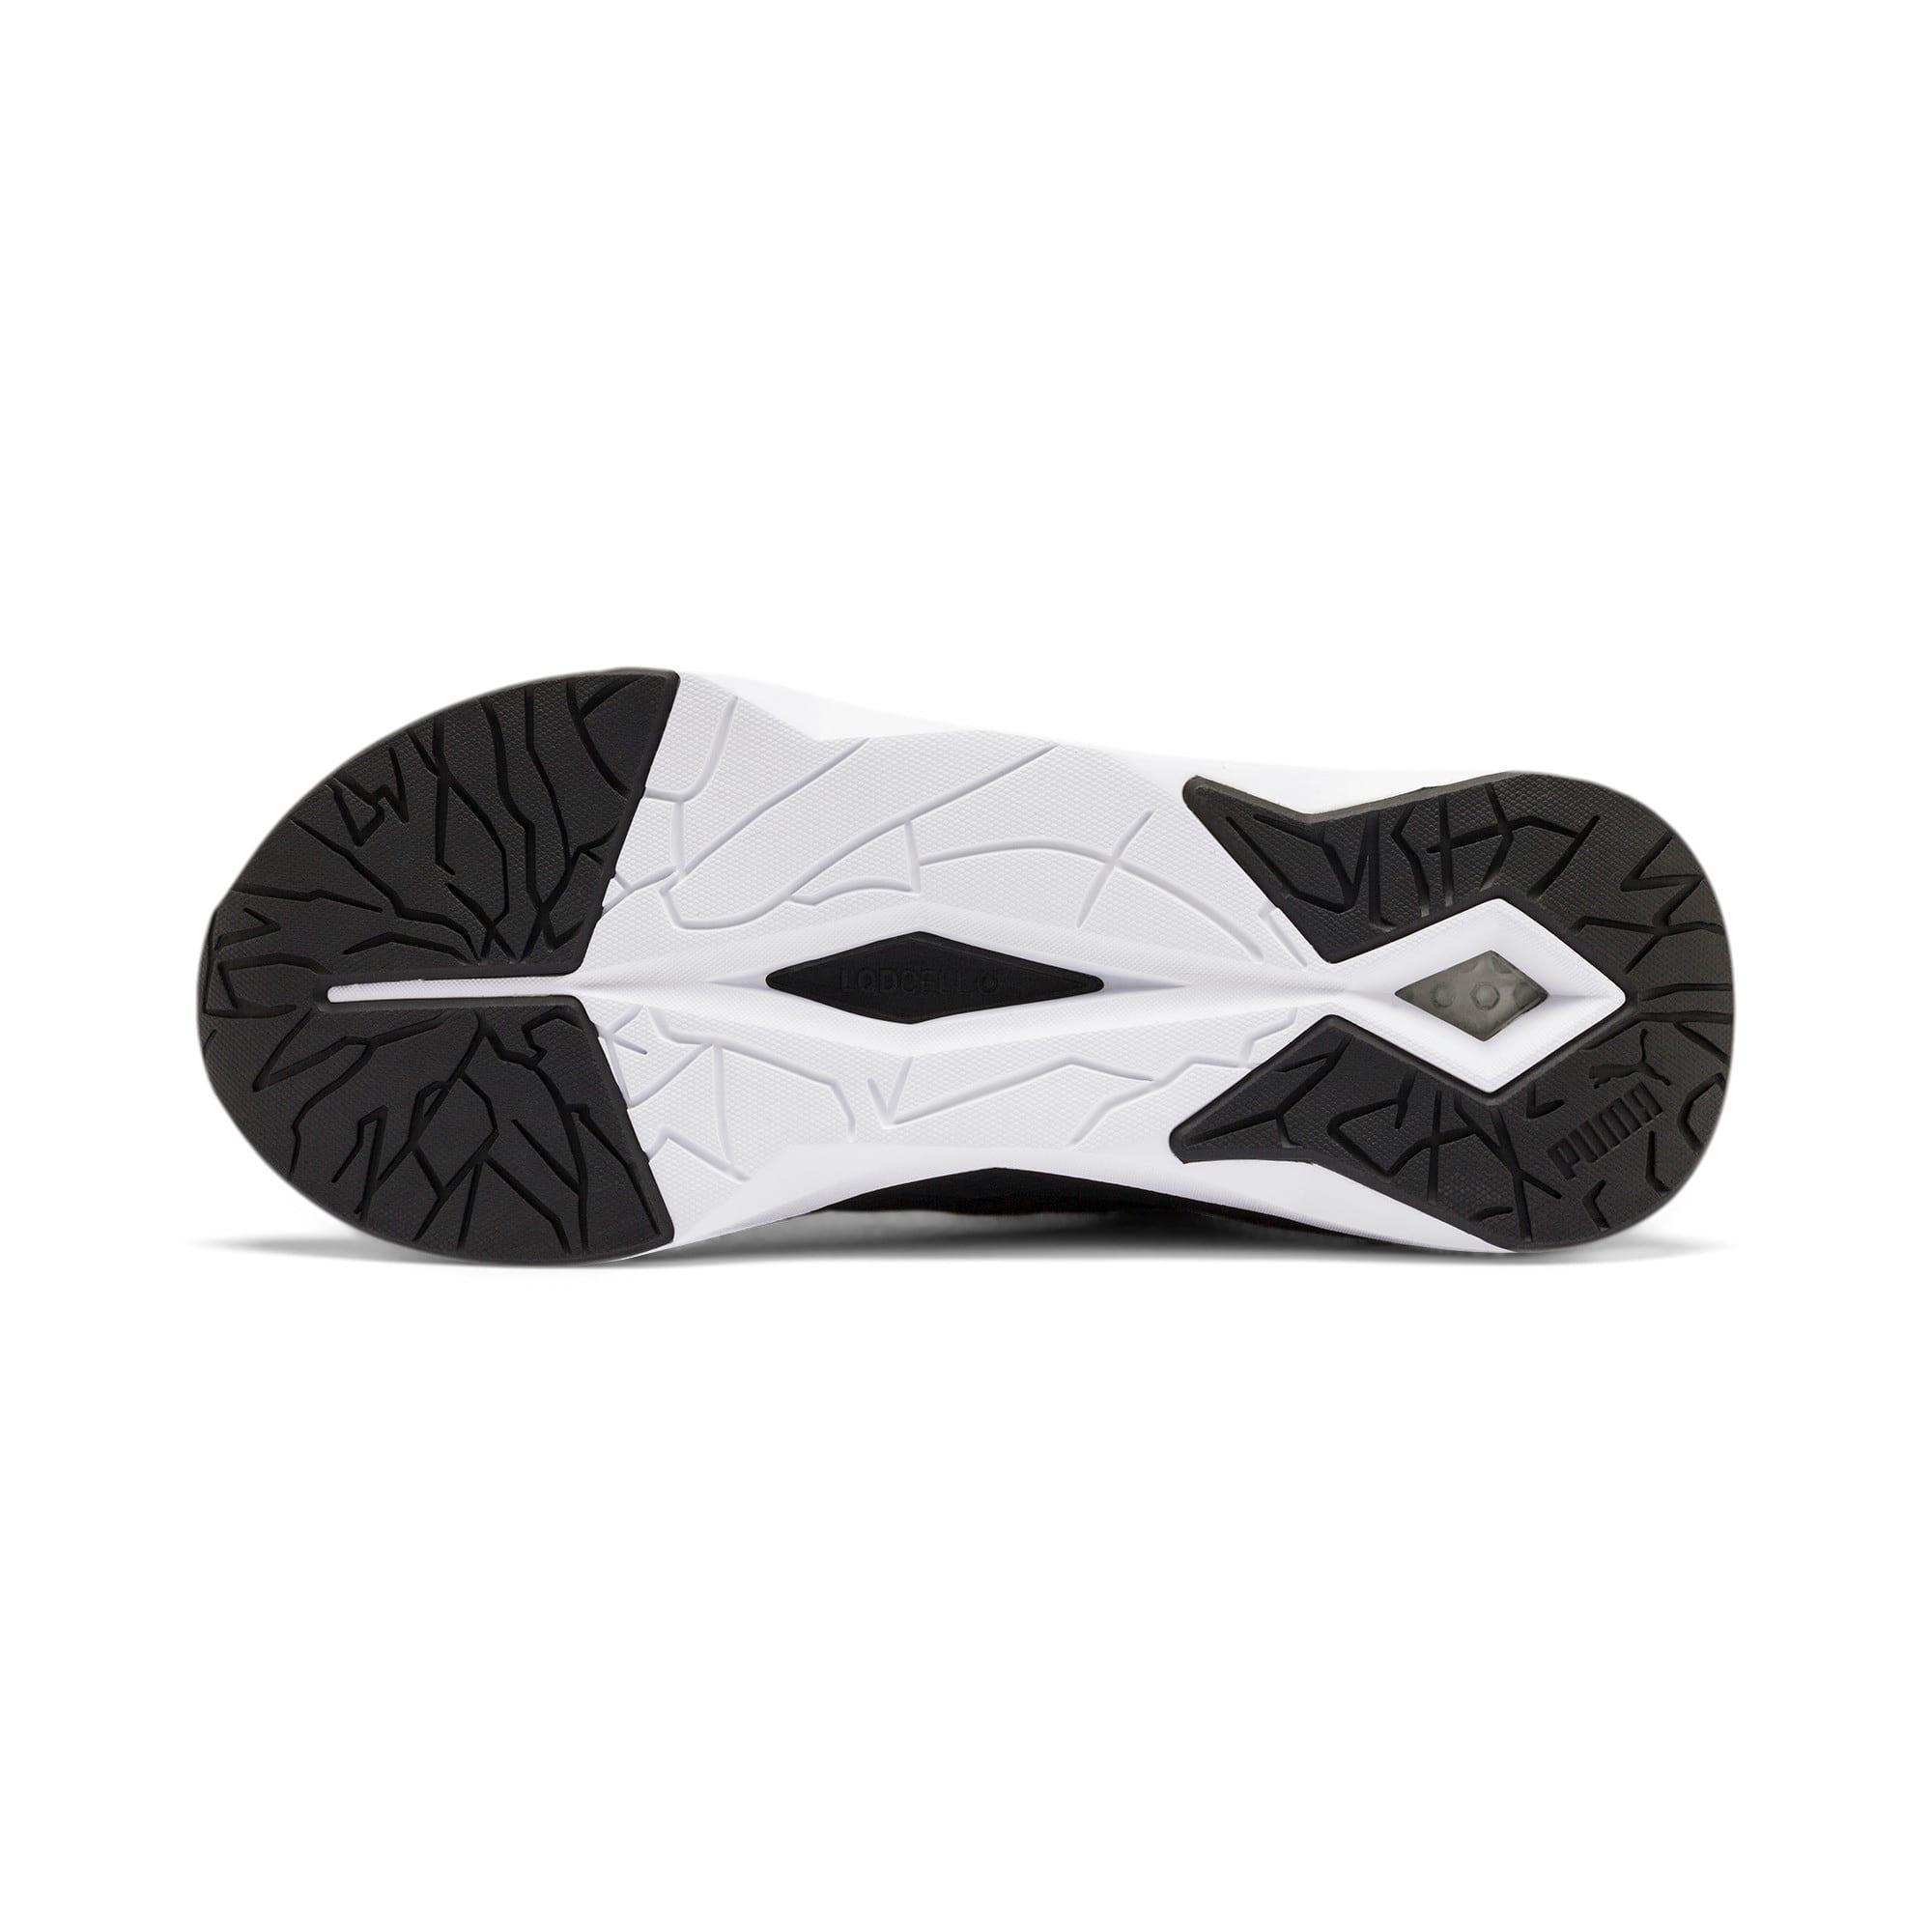 Miniatura 5 de Zapatos deentrenamiento LQDCELL Shatter XT para mujer, Puma Black-Puma White, mediano